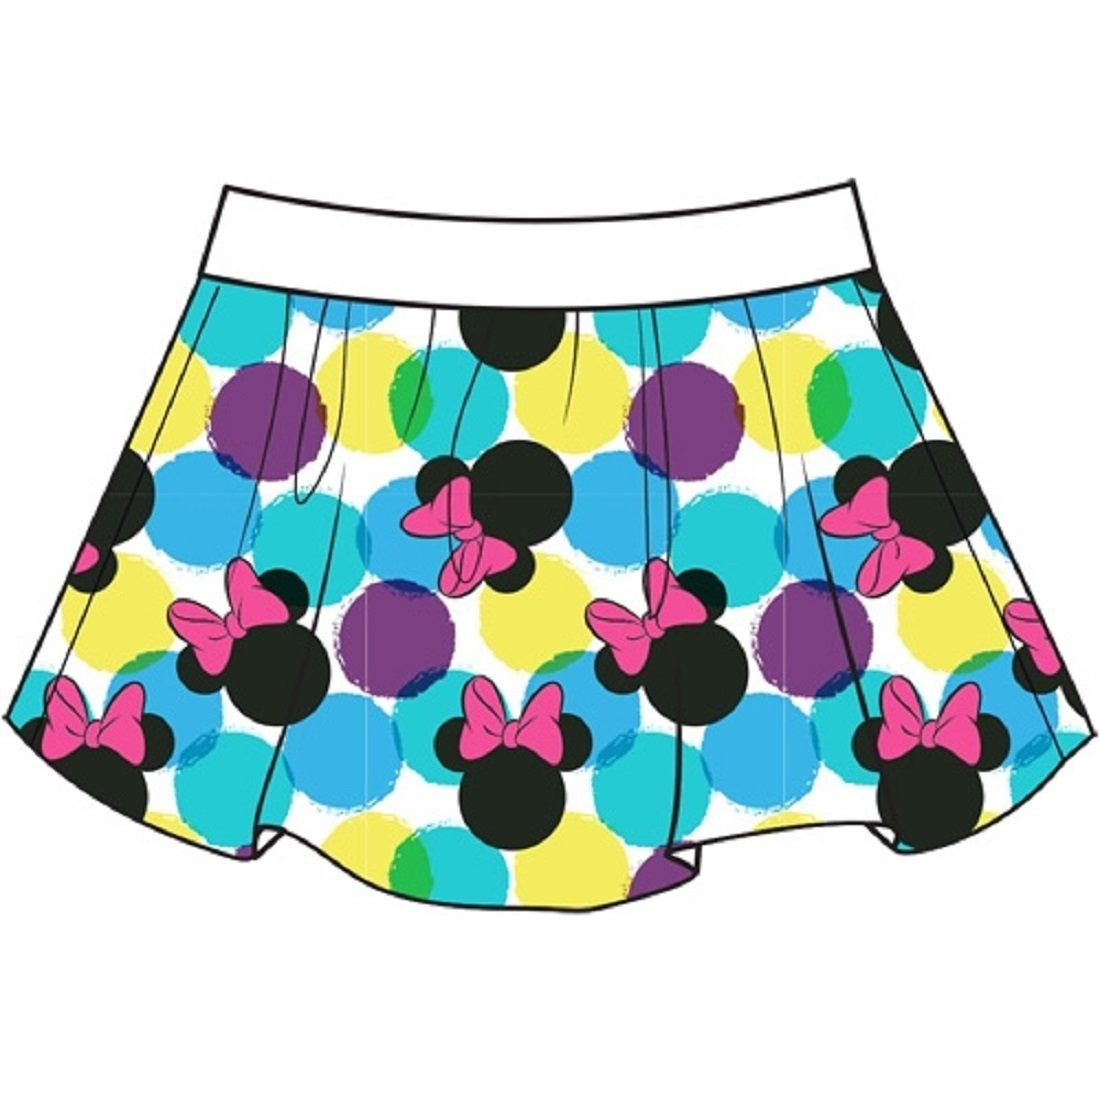 Disney Youth Girls Skort Skirt/Short Simple Minnie Print (Multi Colored, X-Small)